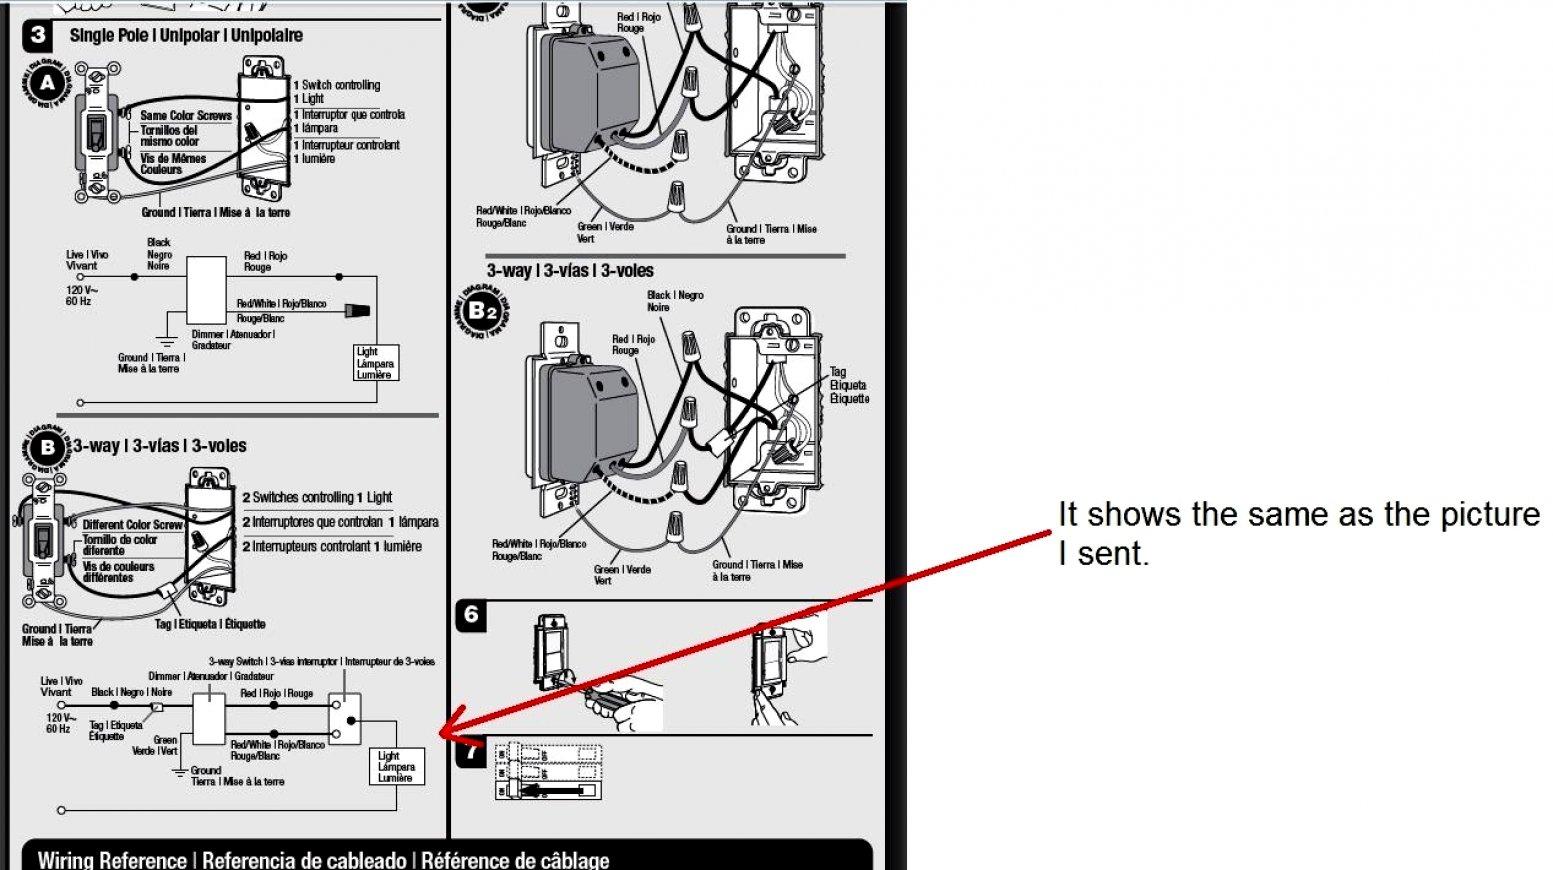 3 Way Wiring Diagram Lutron   Manual E-Books - Lutron 3 Way Dimmer Wiring Diagram